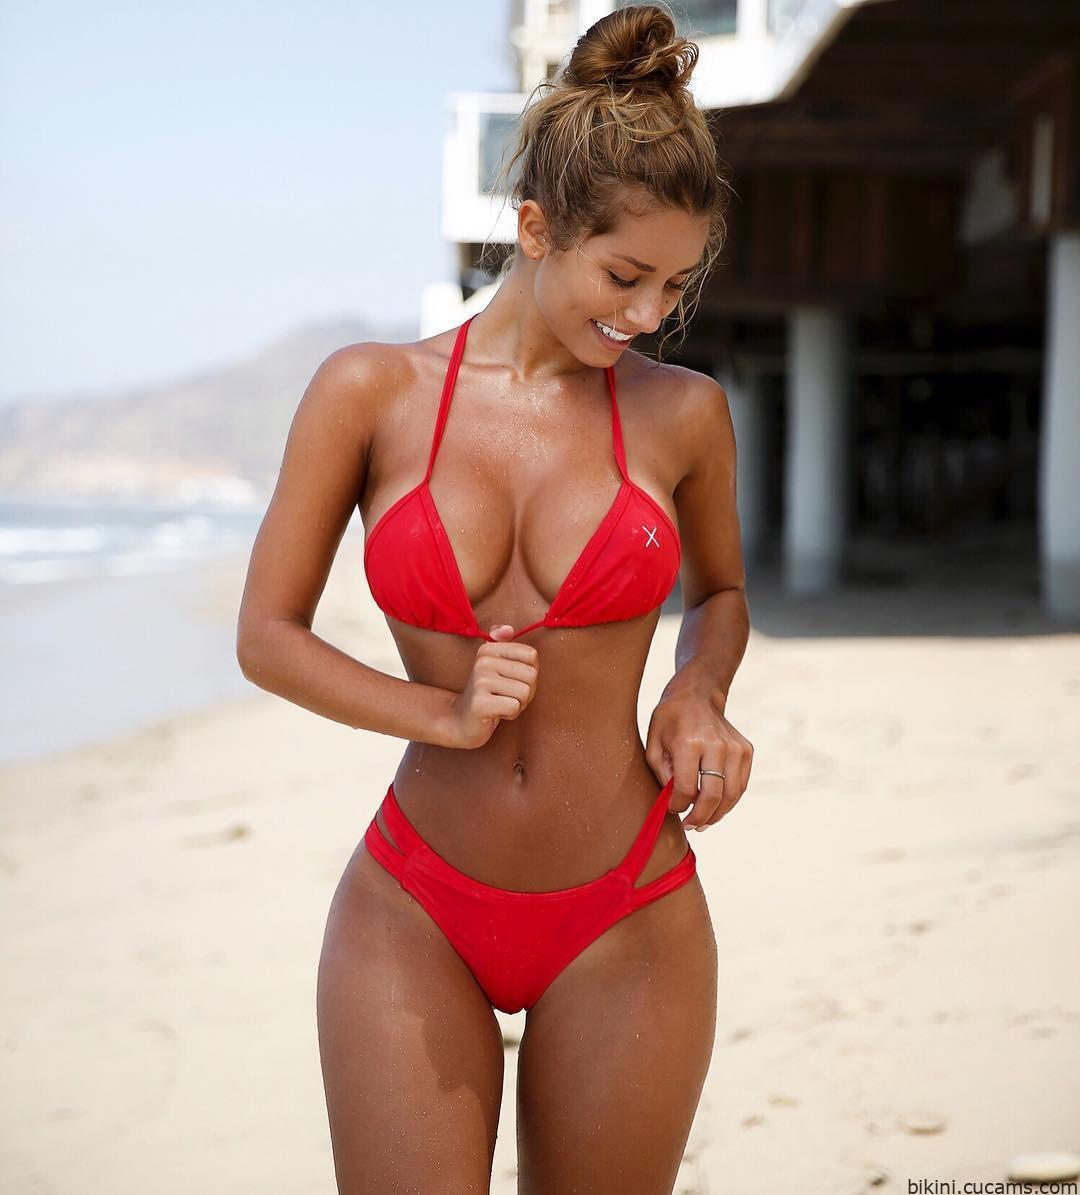 Bikini Shorts Farting by bikini.cucams.com